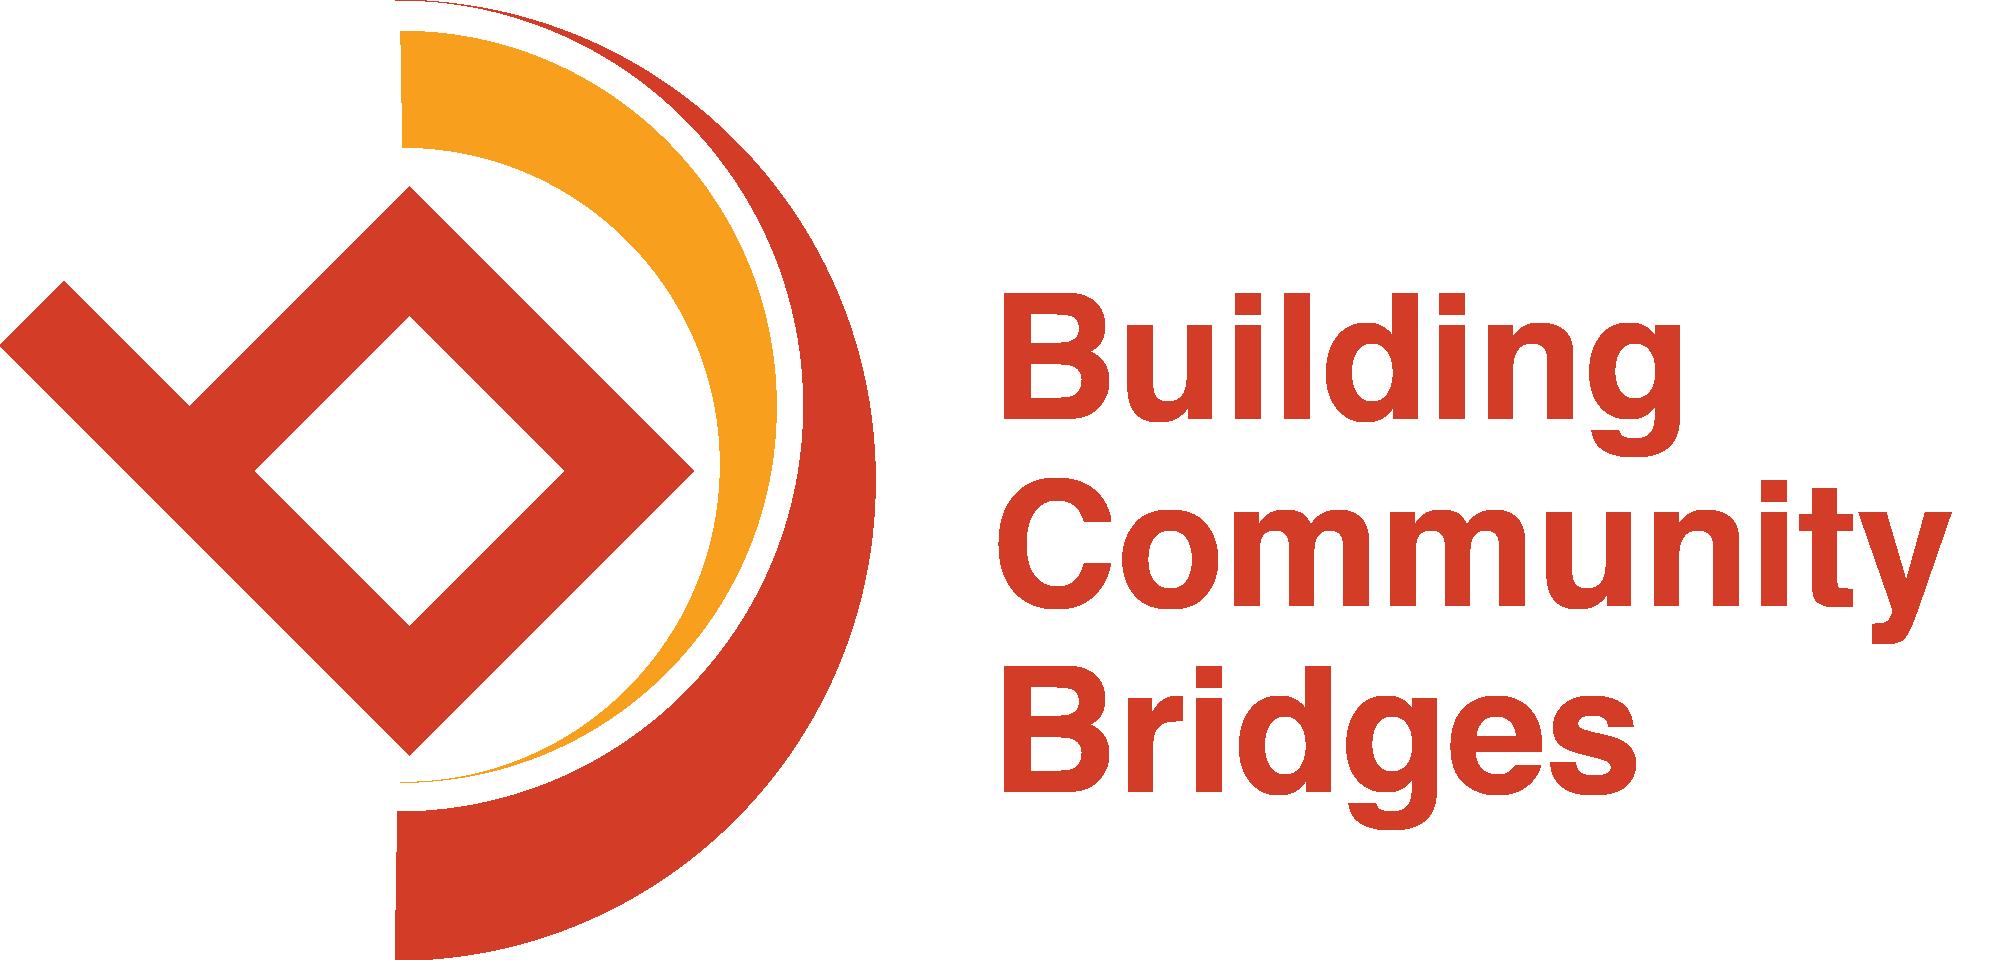 Building Community Bridges